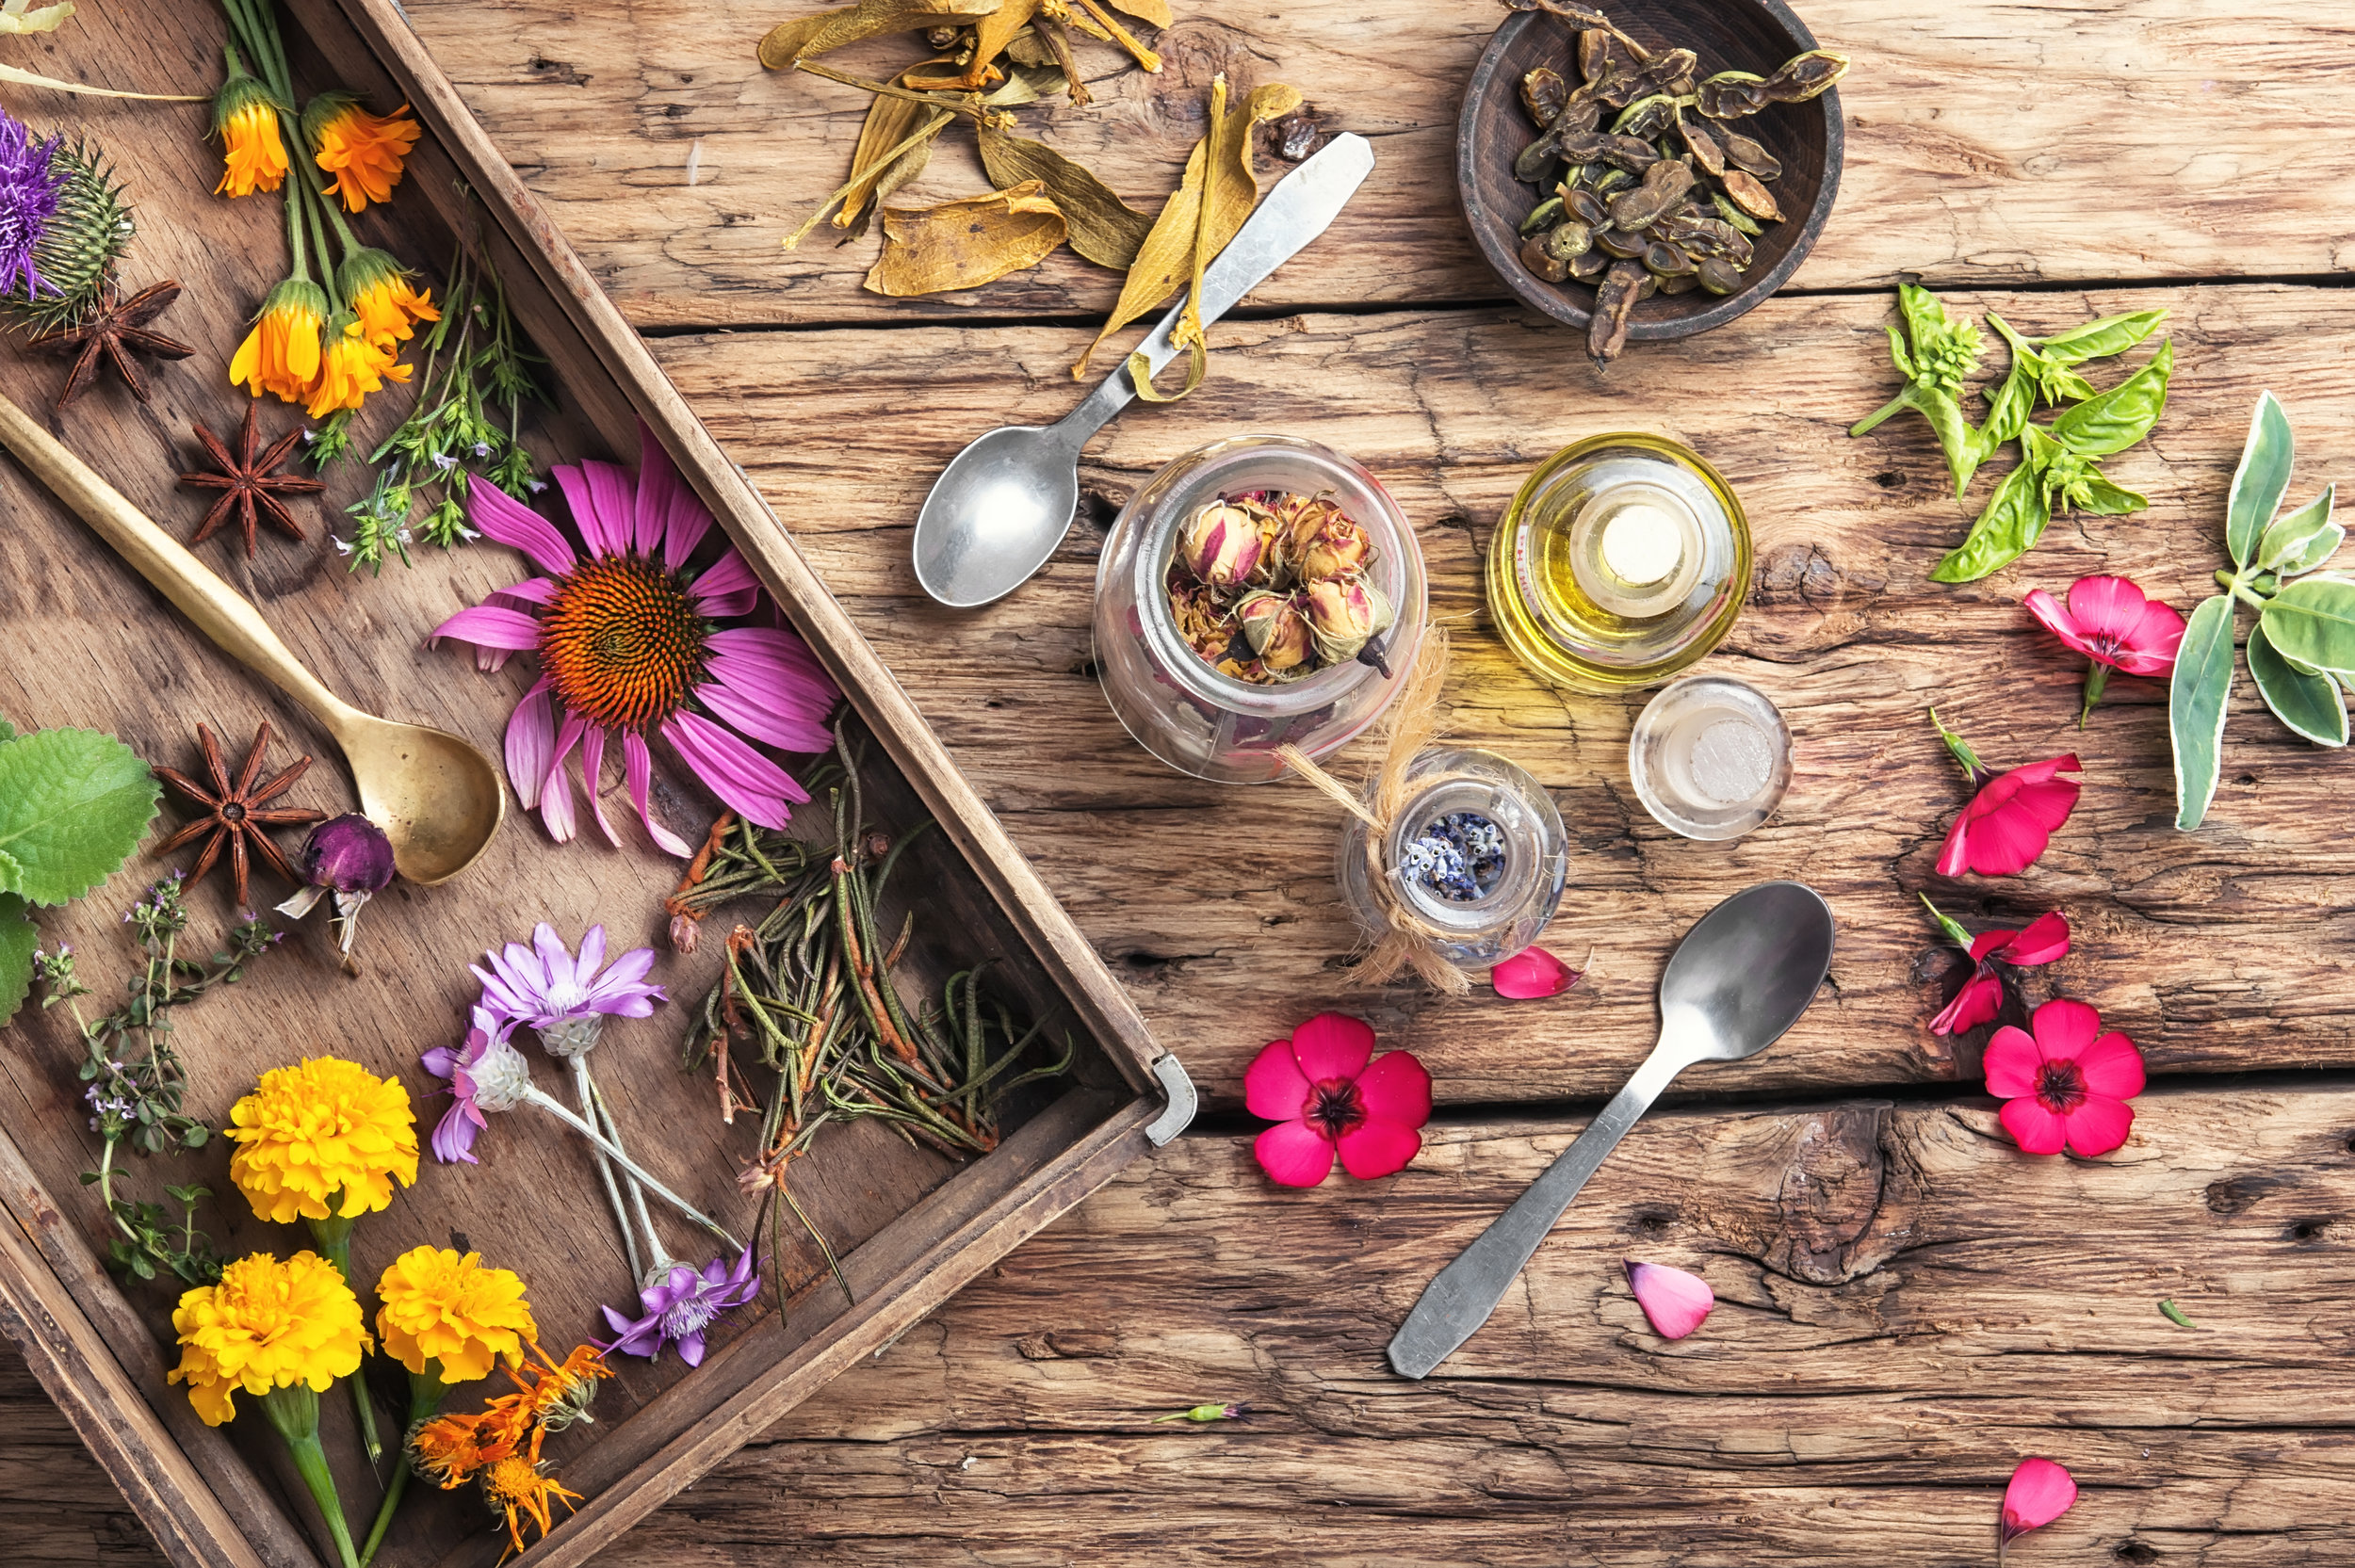 motley-healthy-herbs-P3RRJZ6.jpg